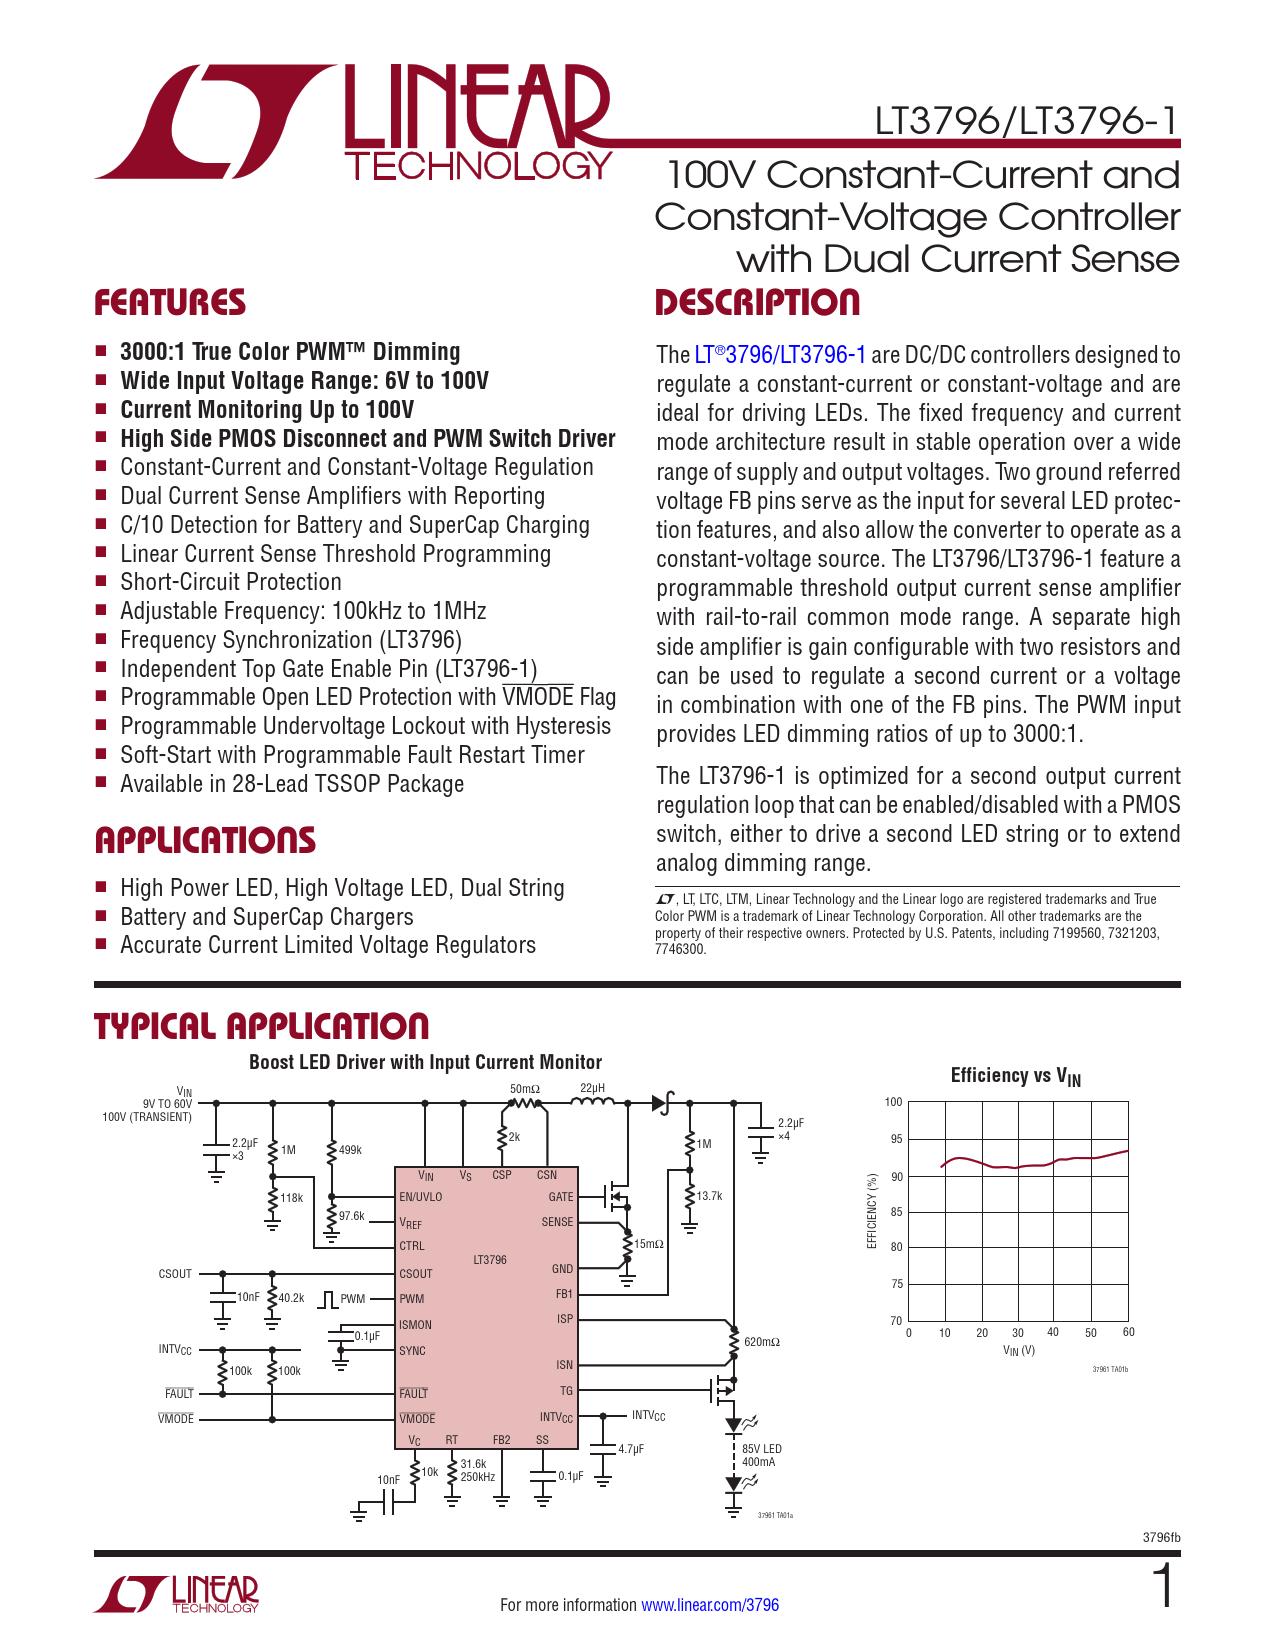 Datasheet LT3796, LT3796-1 Analog Devices